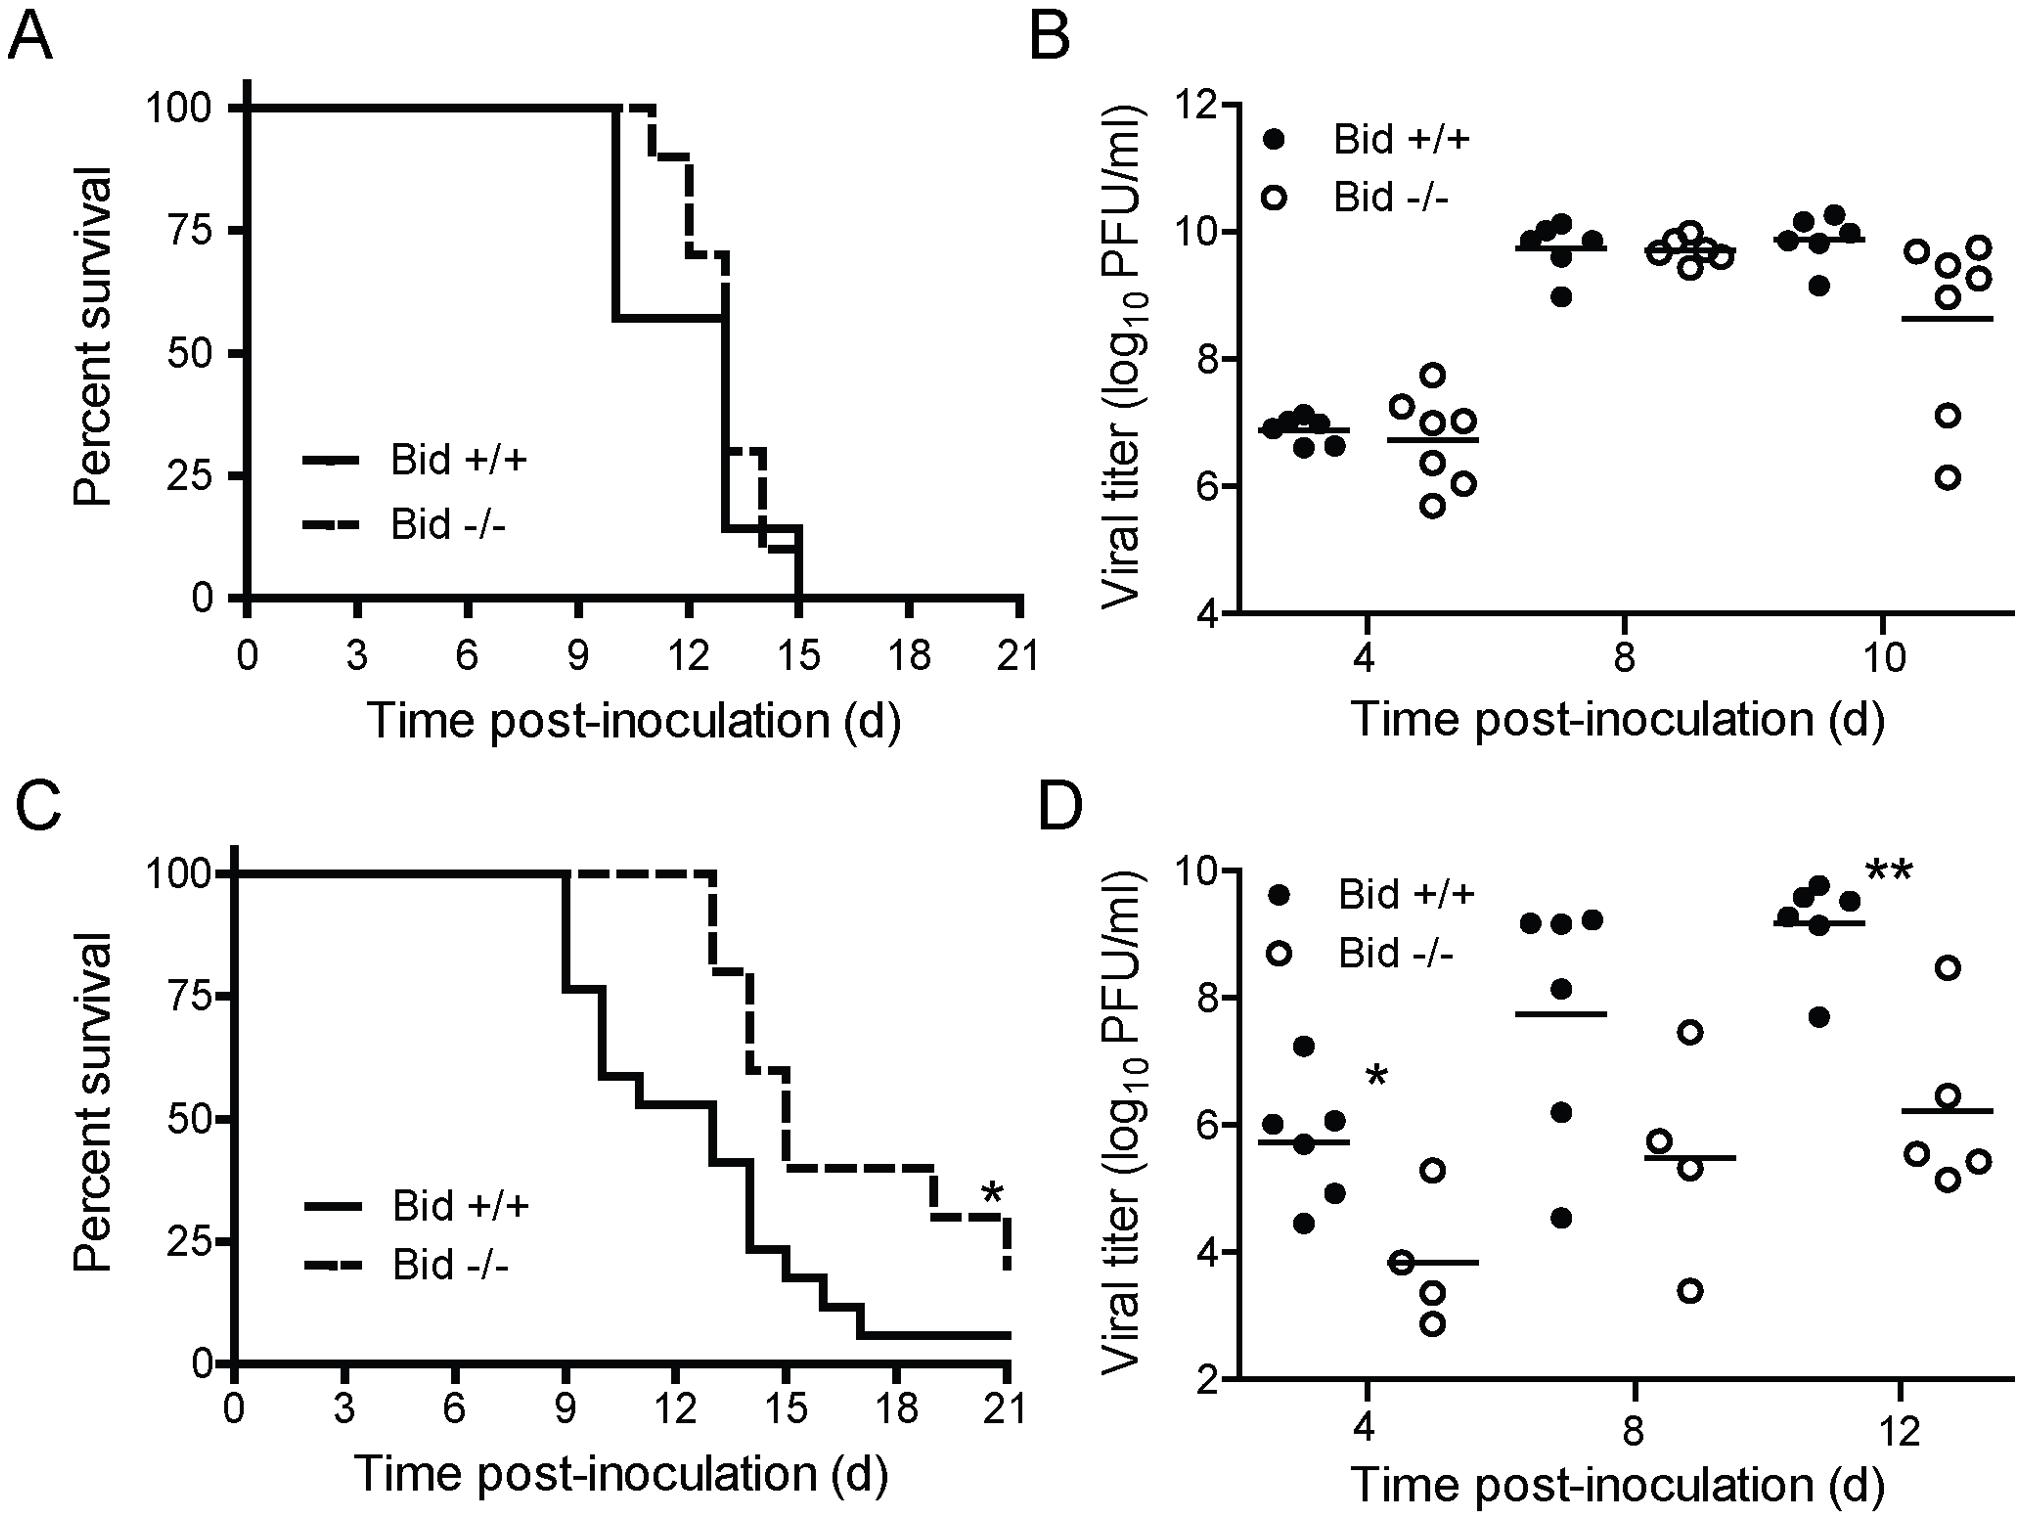 Bid modulates reovirus replication and pathogenesis following IC inoculation.